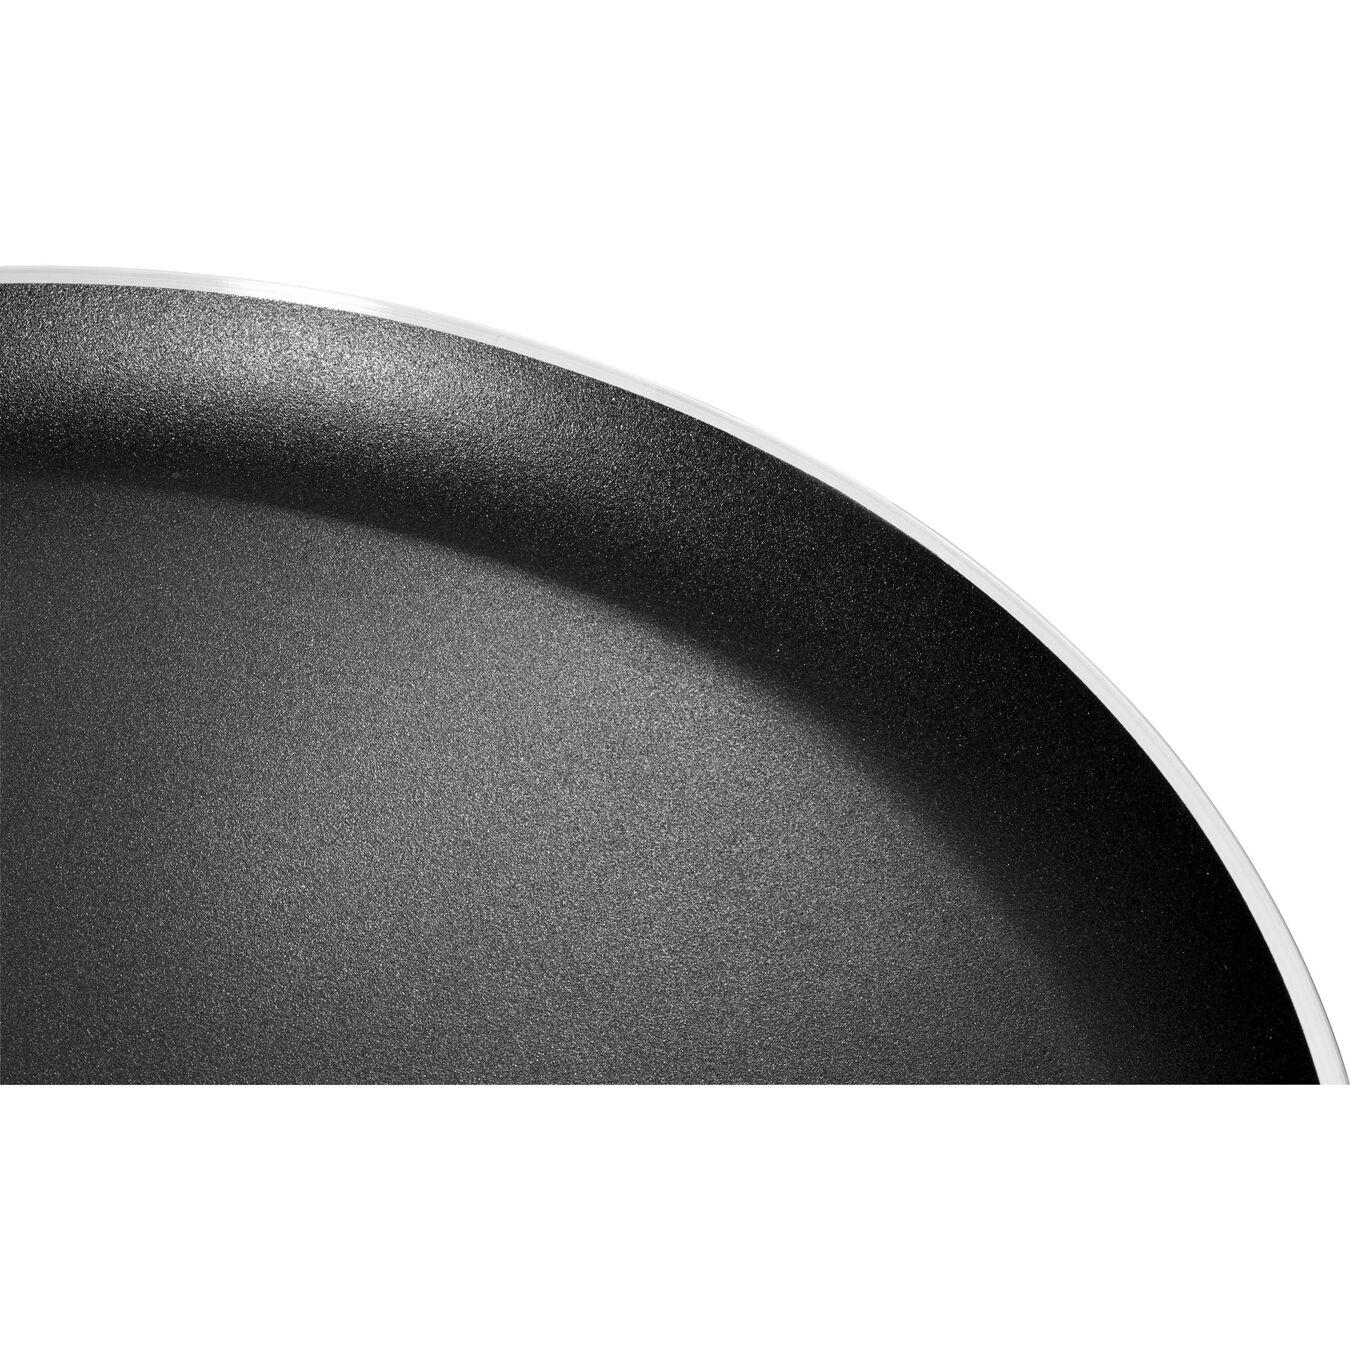 Crêpes-Pfanne 25 cm, Aluminium, Schwarz,,large 6